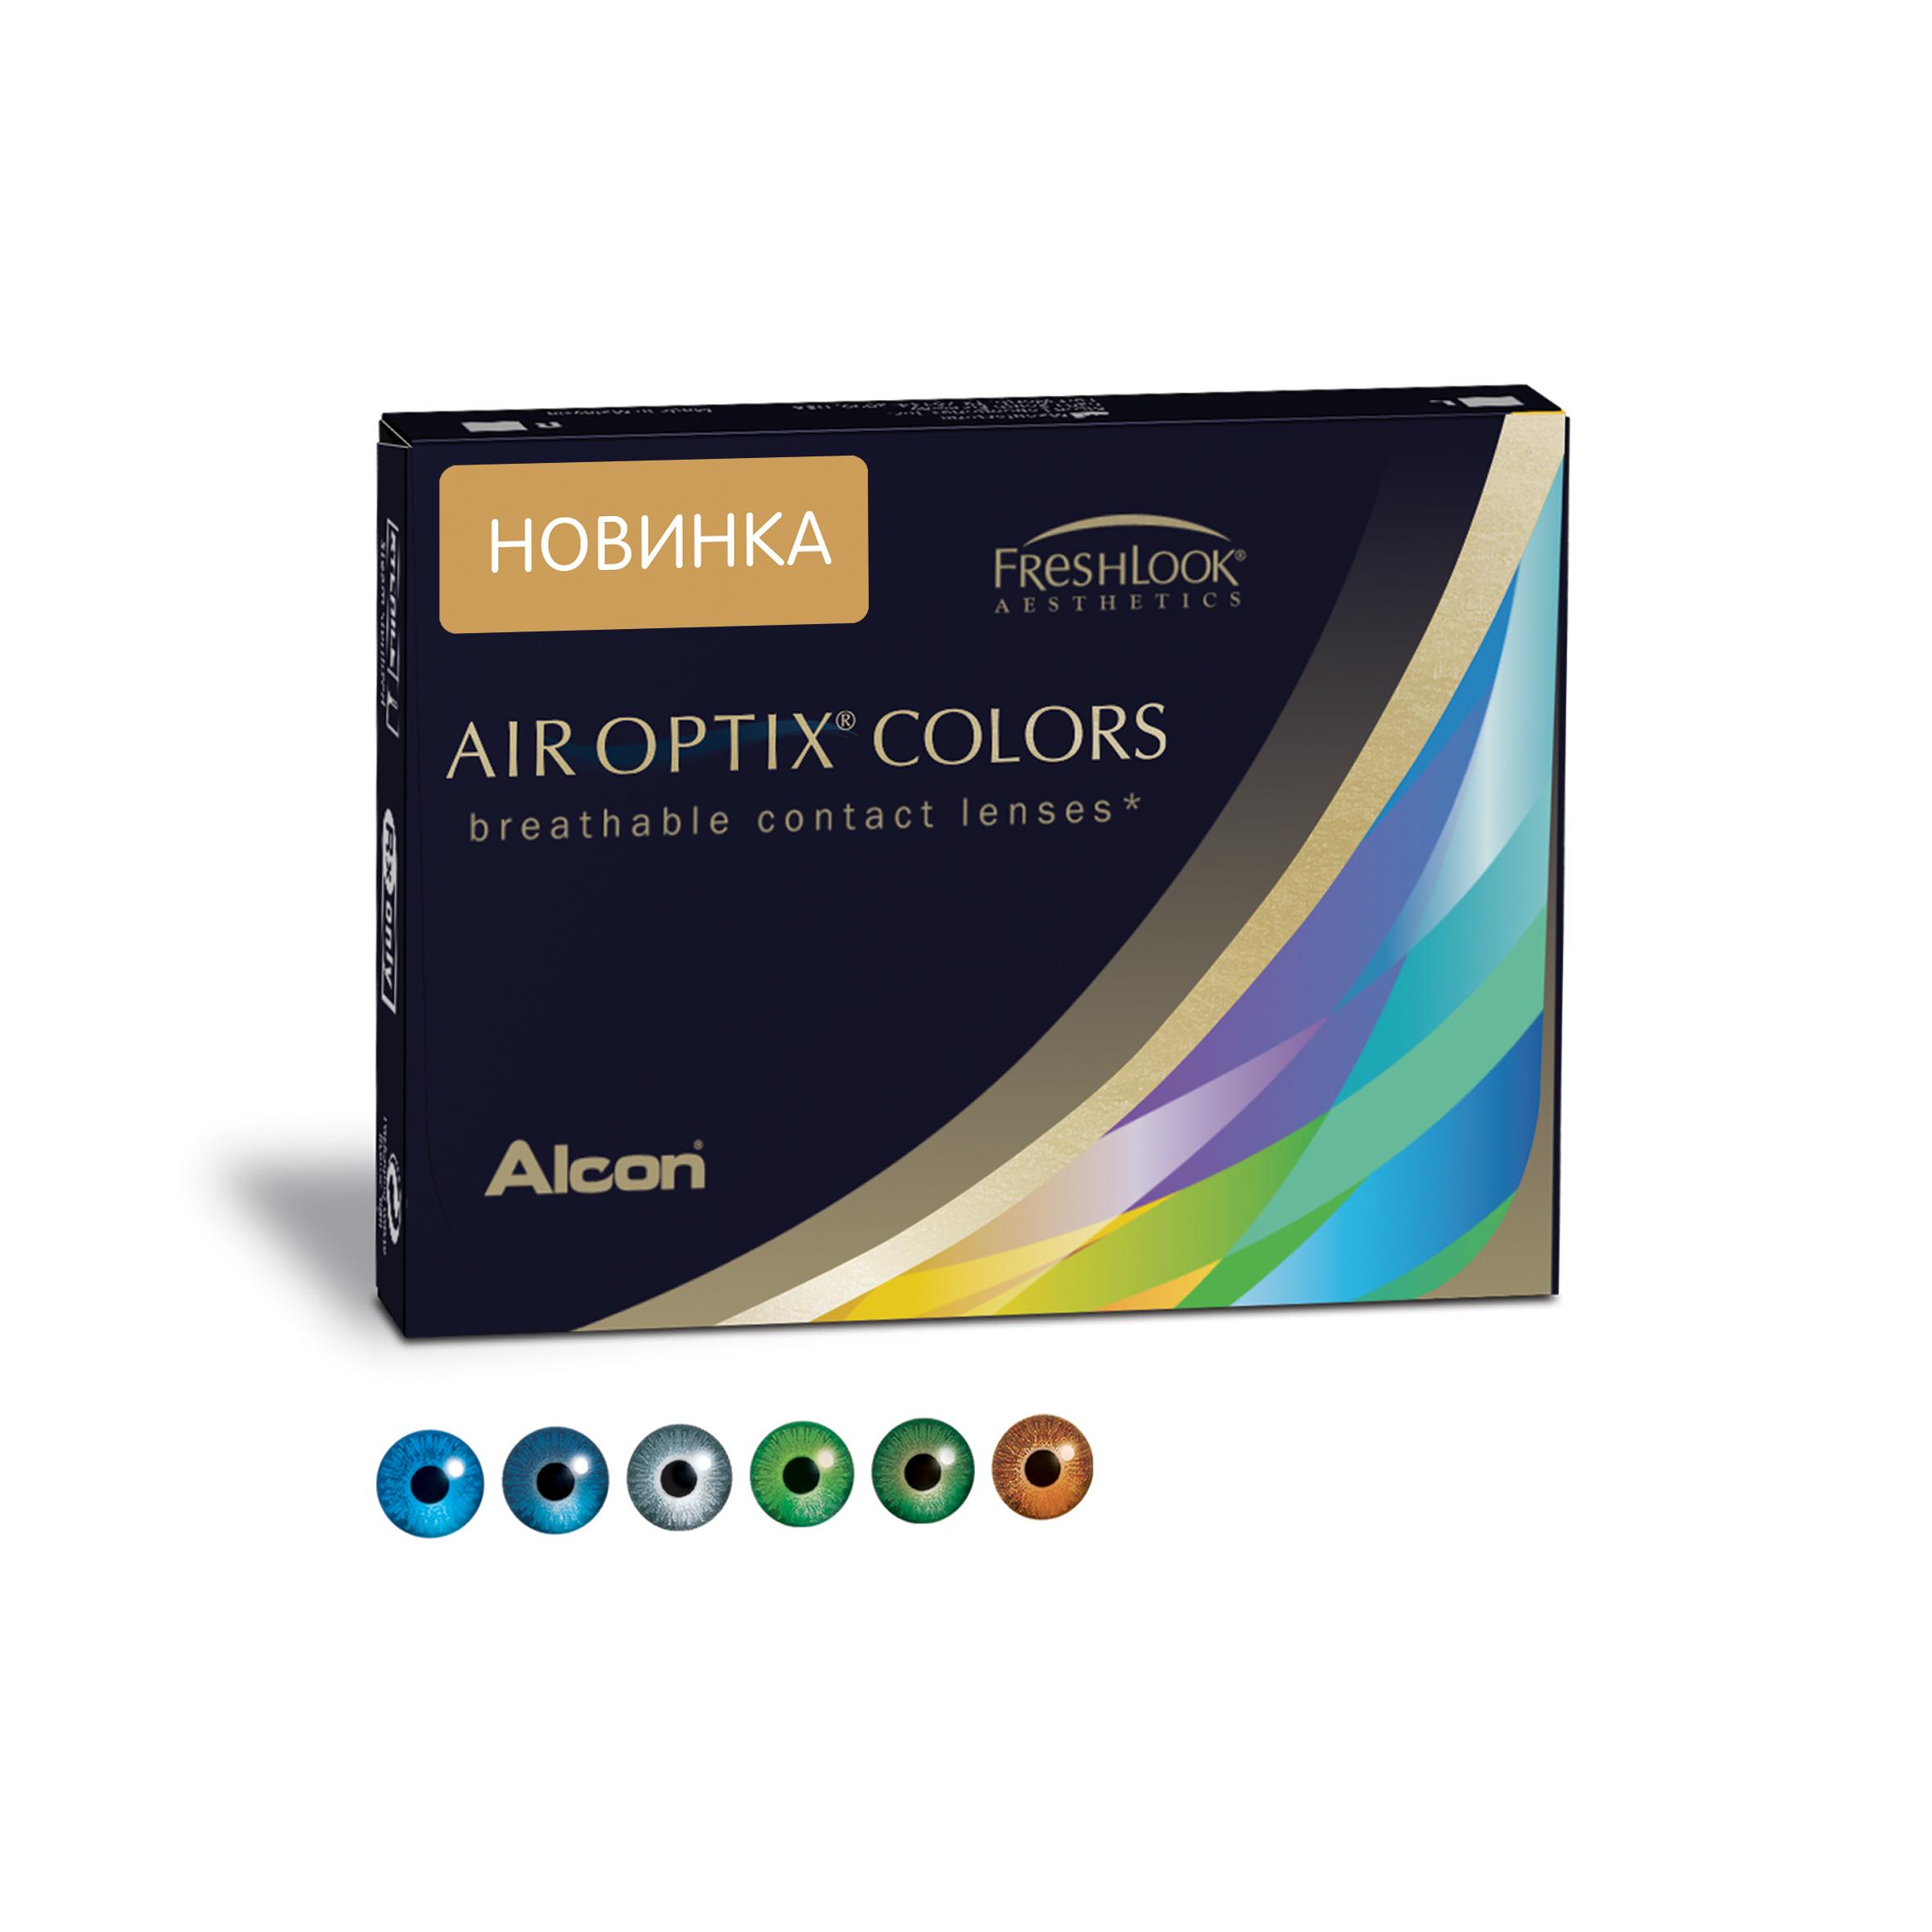 Аlcon контактные линзы Air Optix Colors 2 шт -7.00 Honey31746325Мягкие контактные линзы